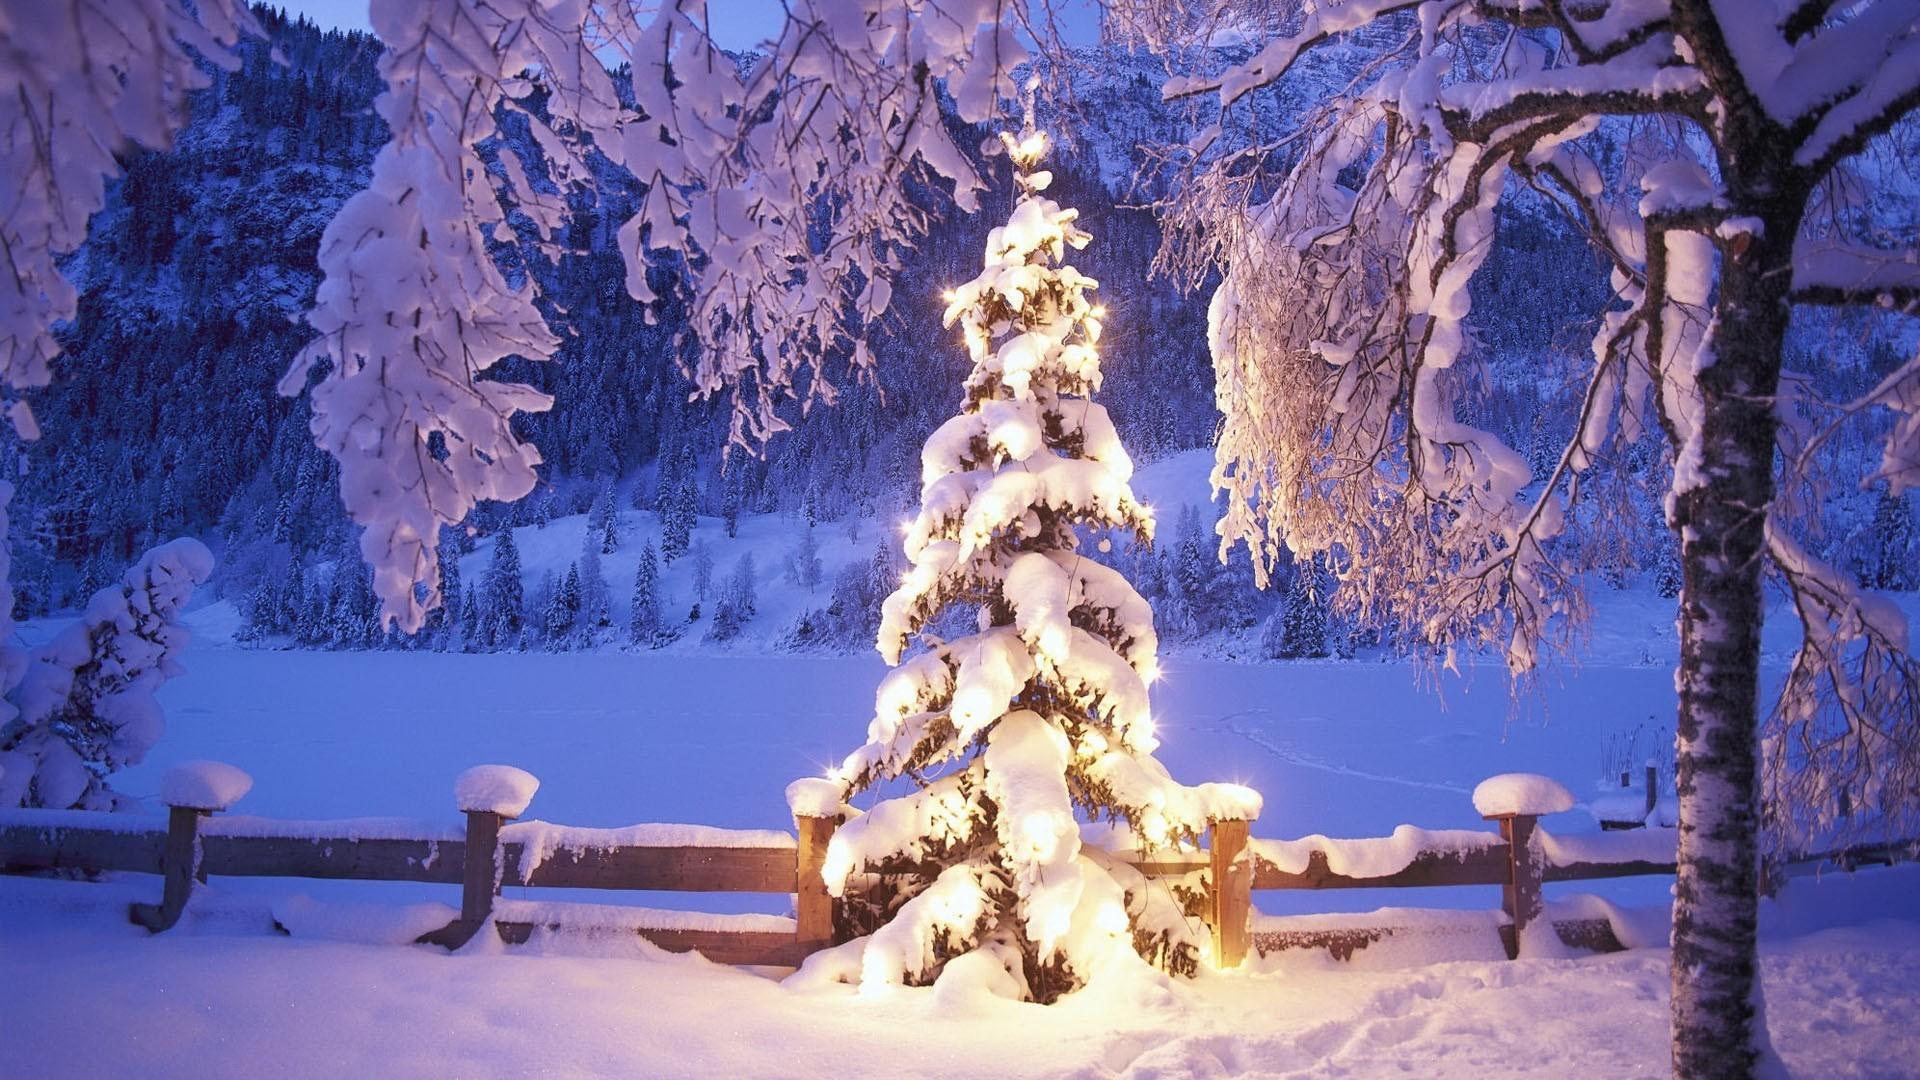 Sfondi Natalizi Tablet.Sfondi Natale 52 Immagini